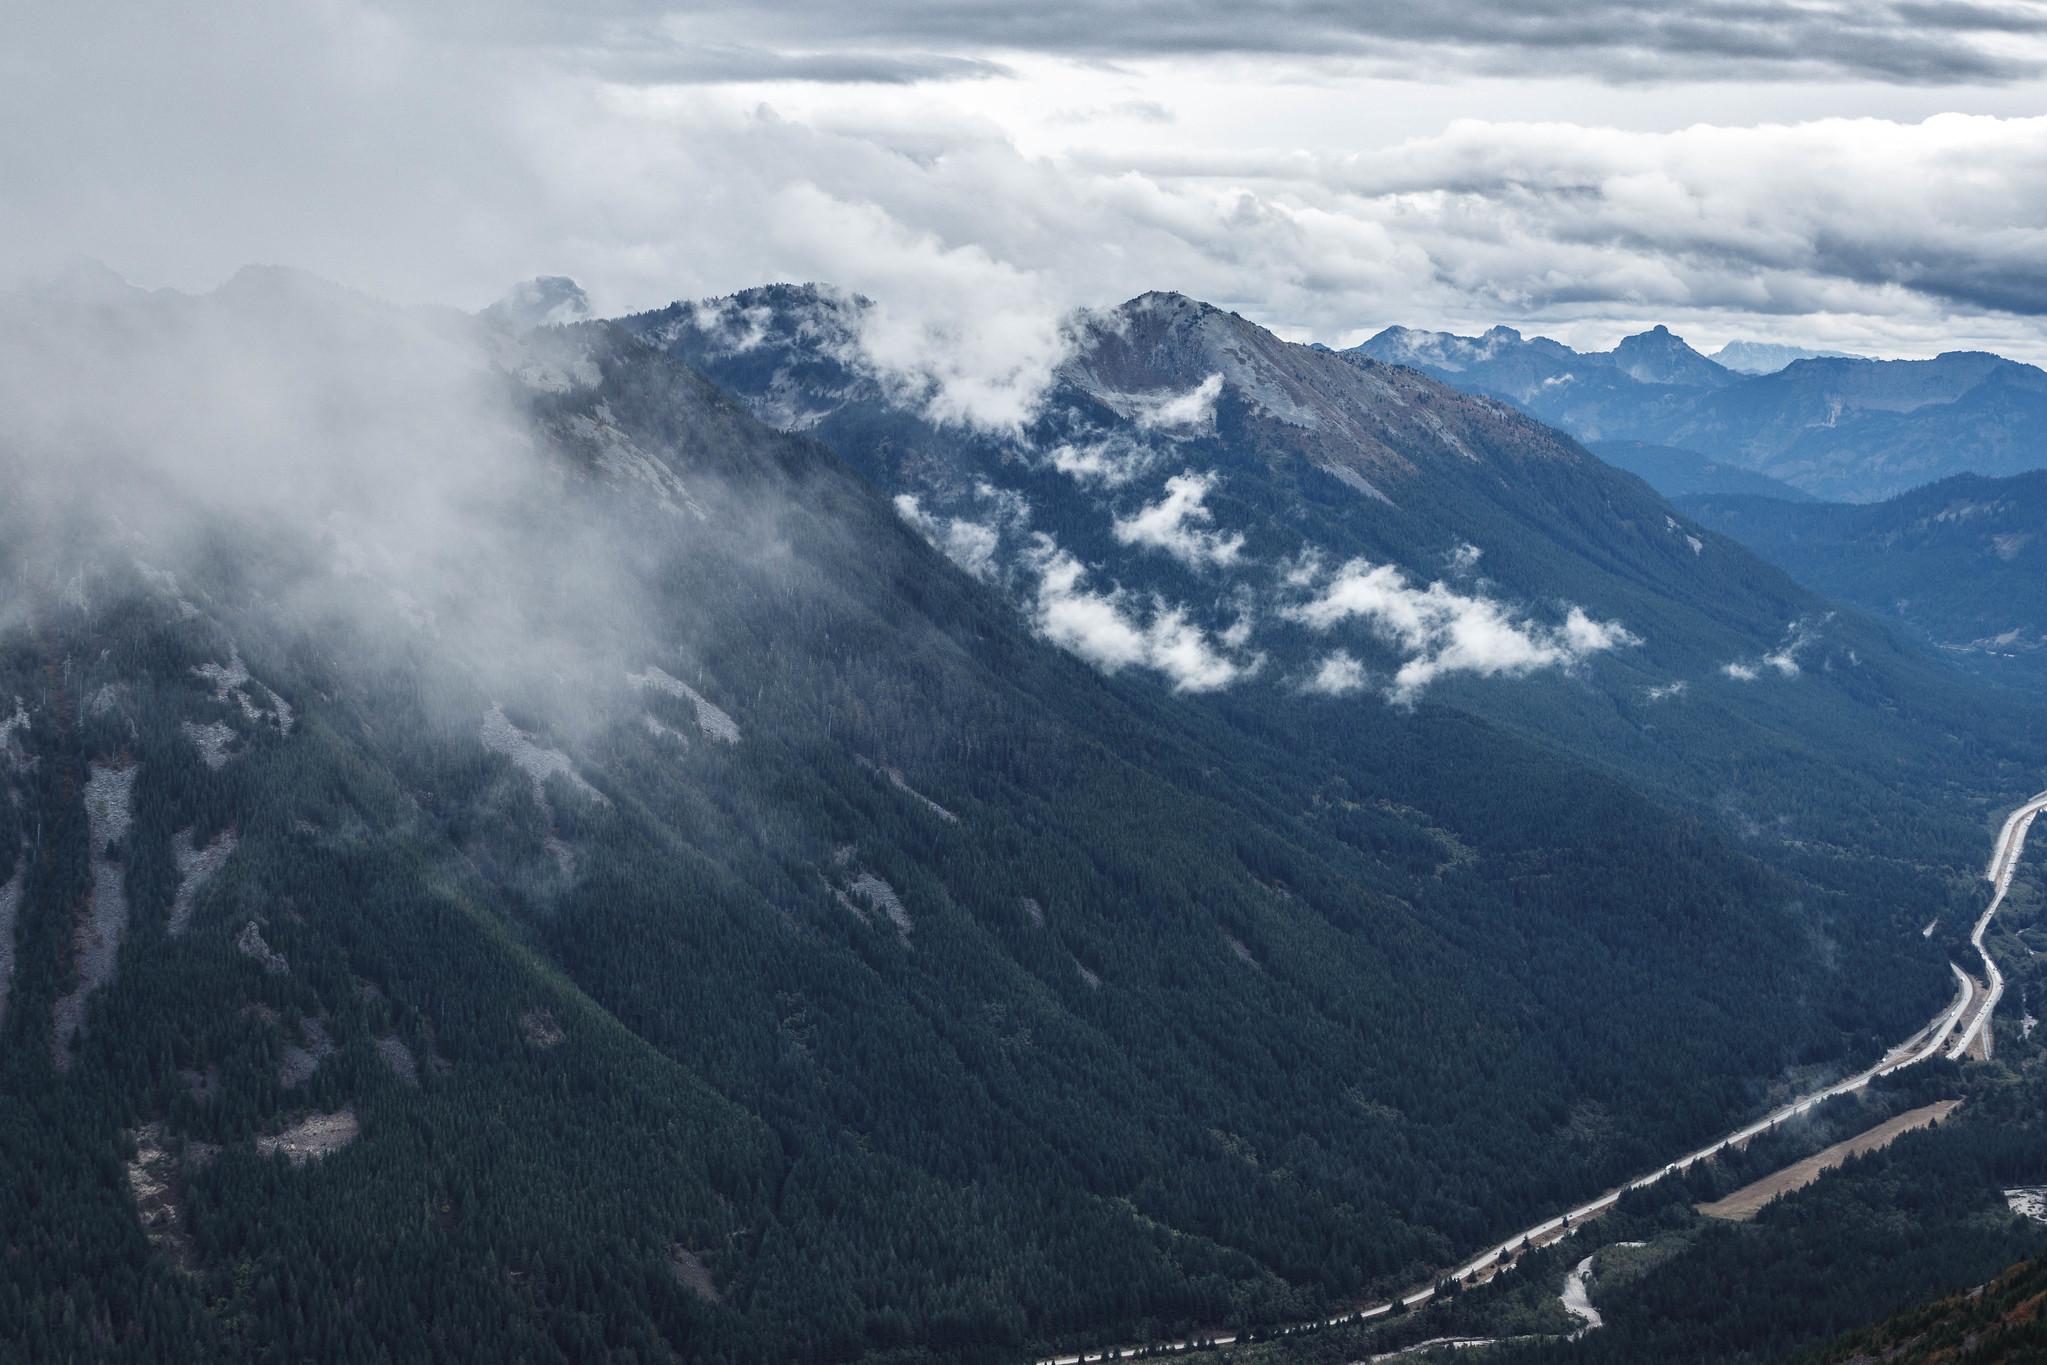 Bandera and Granite Mountains